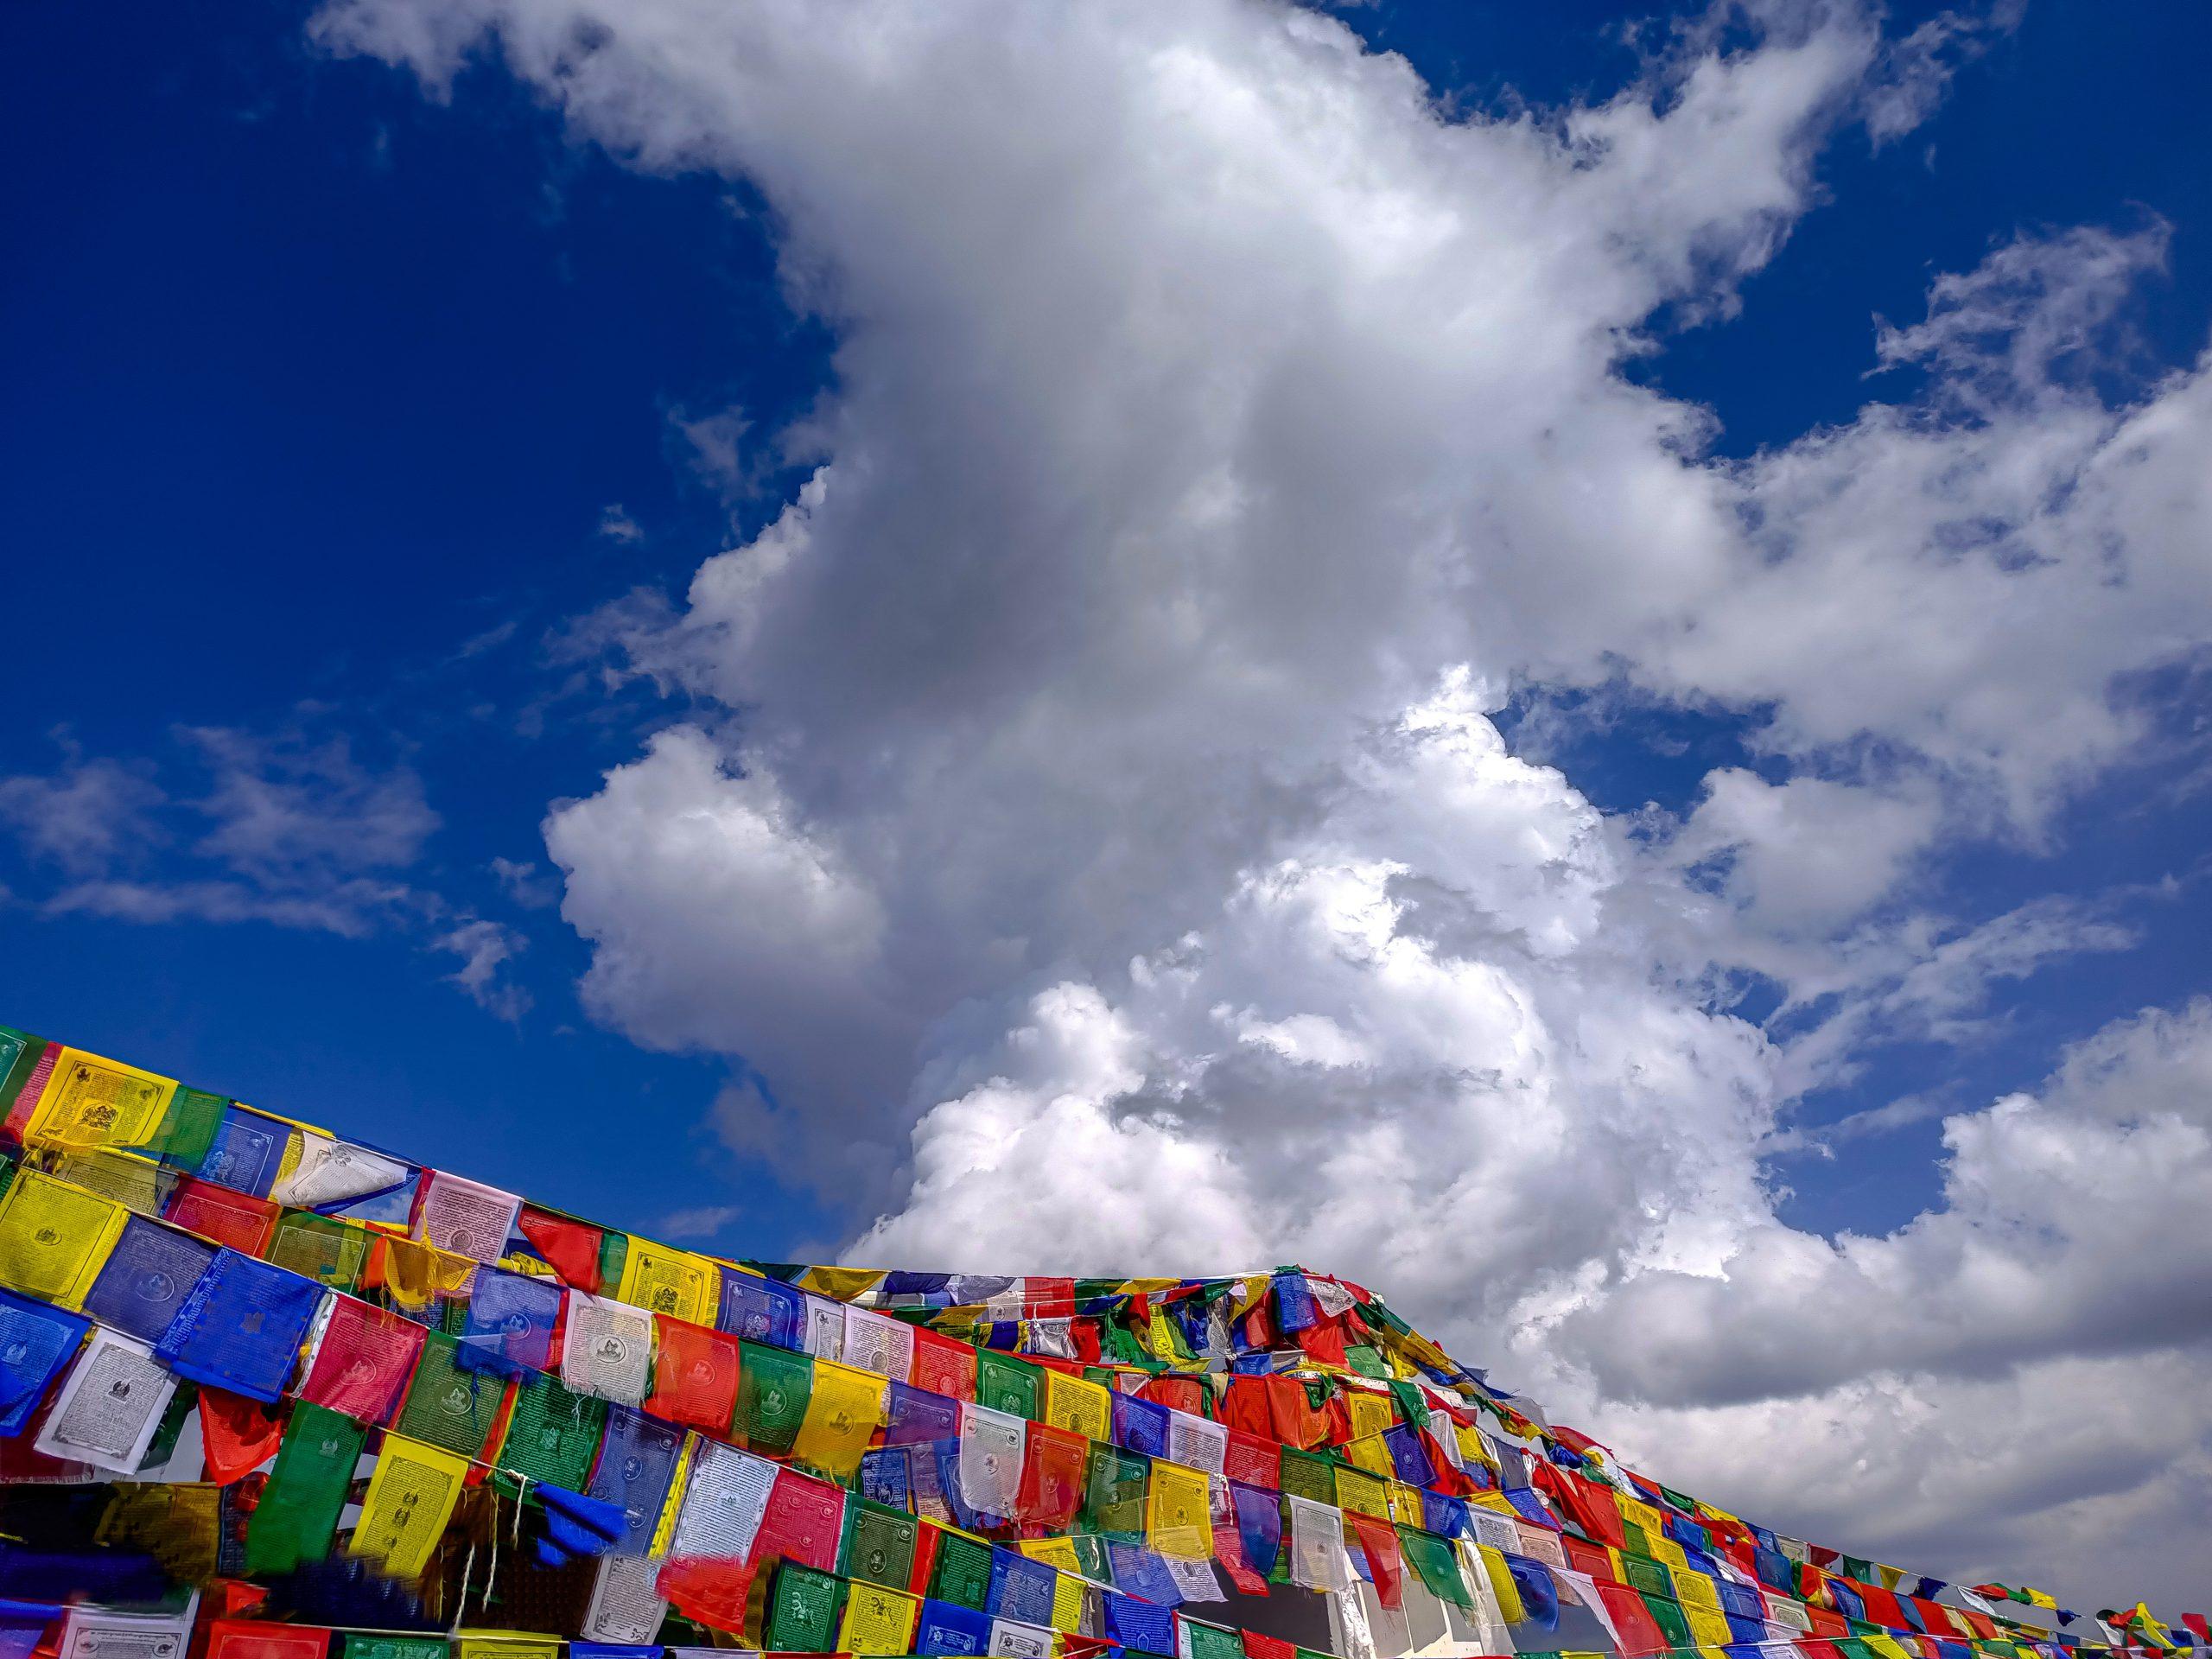 Prayer flags under cloudy sky